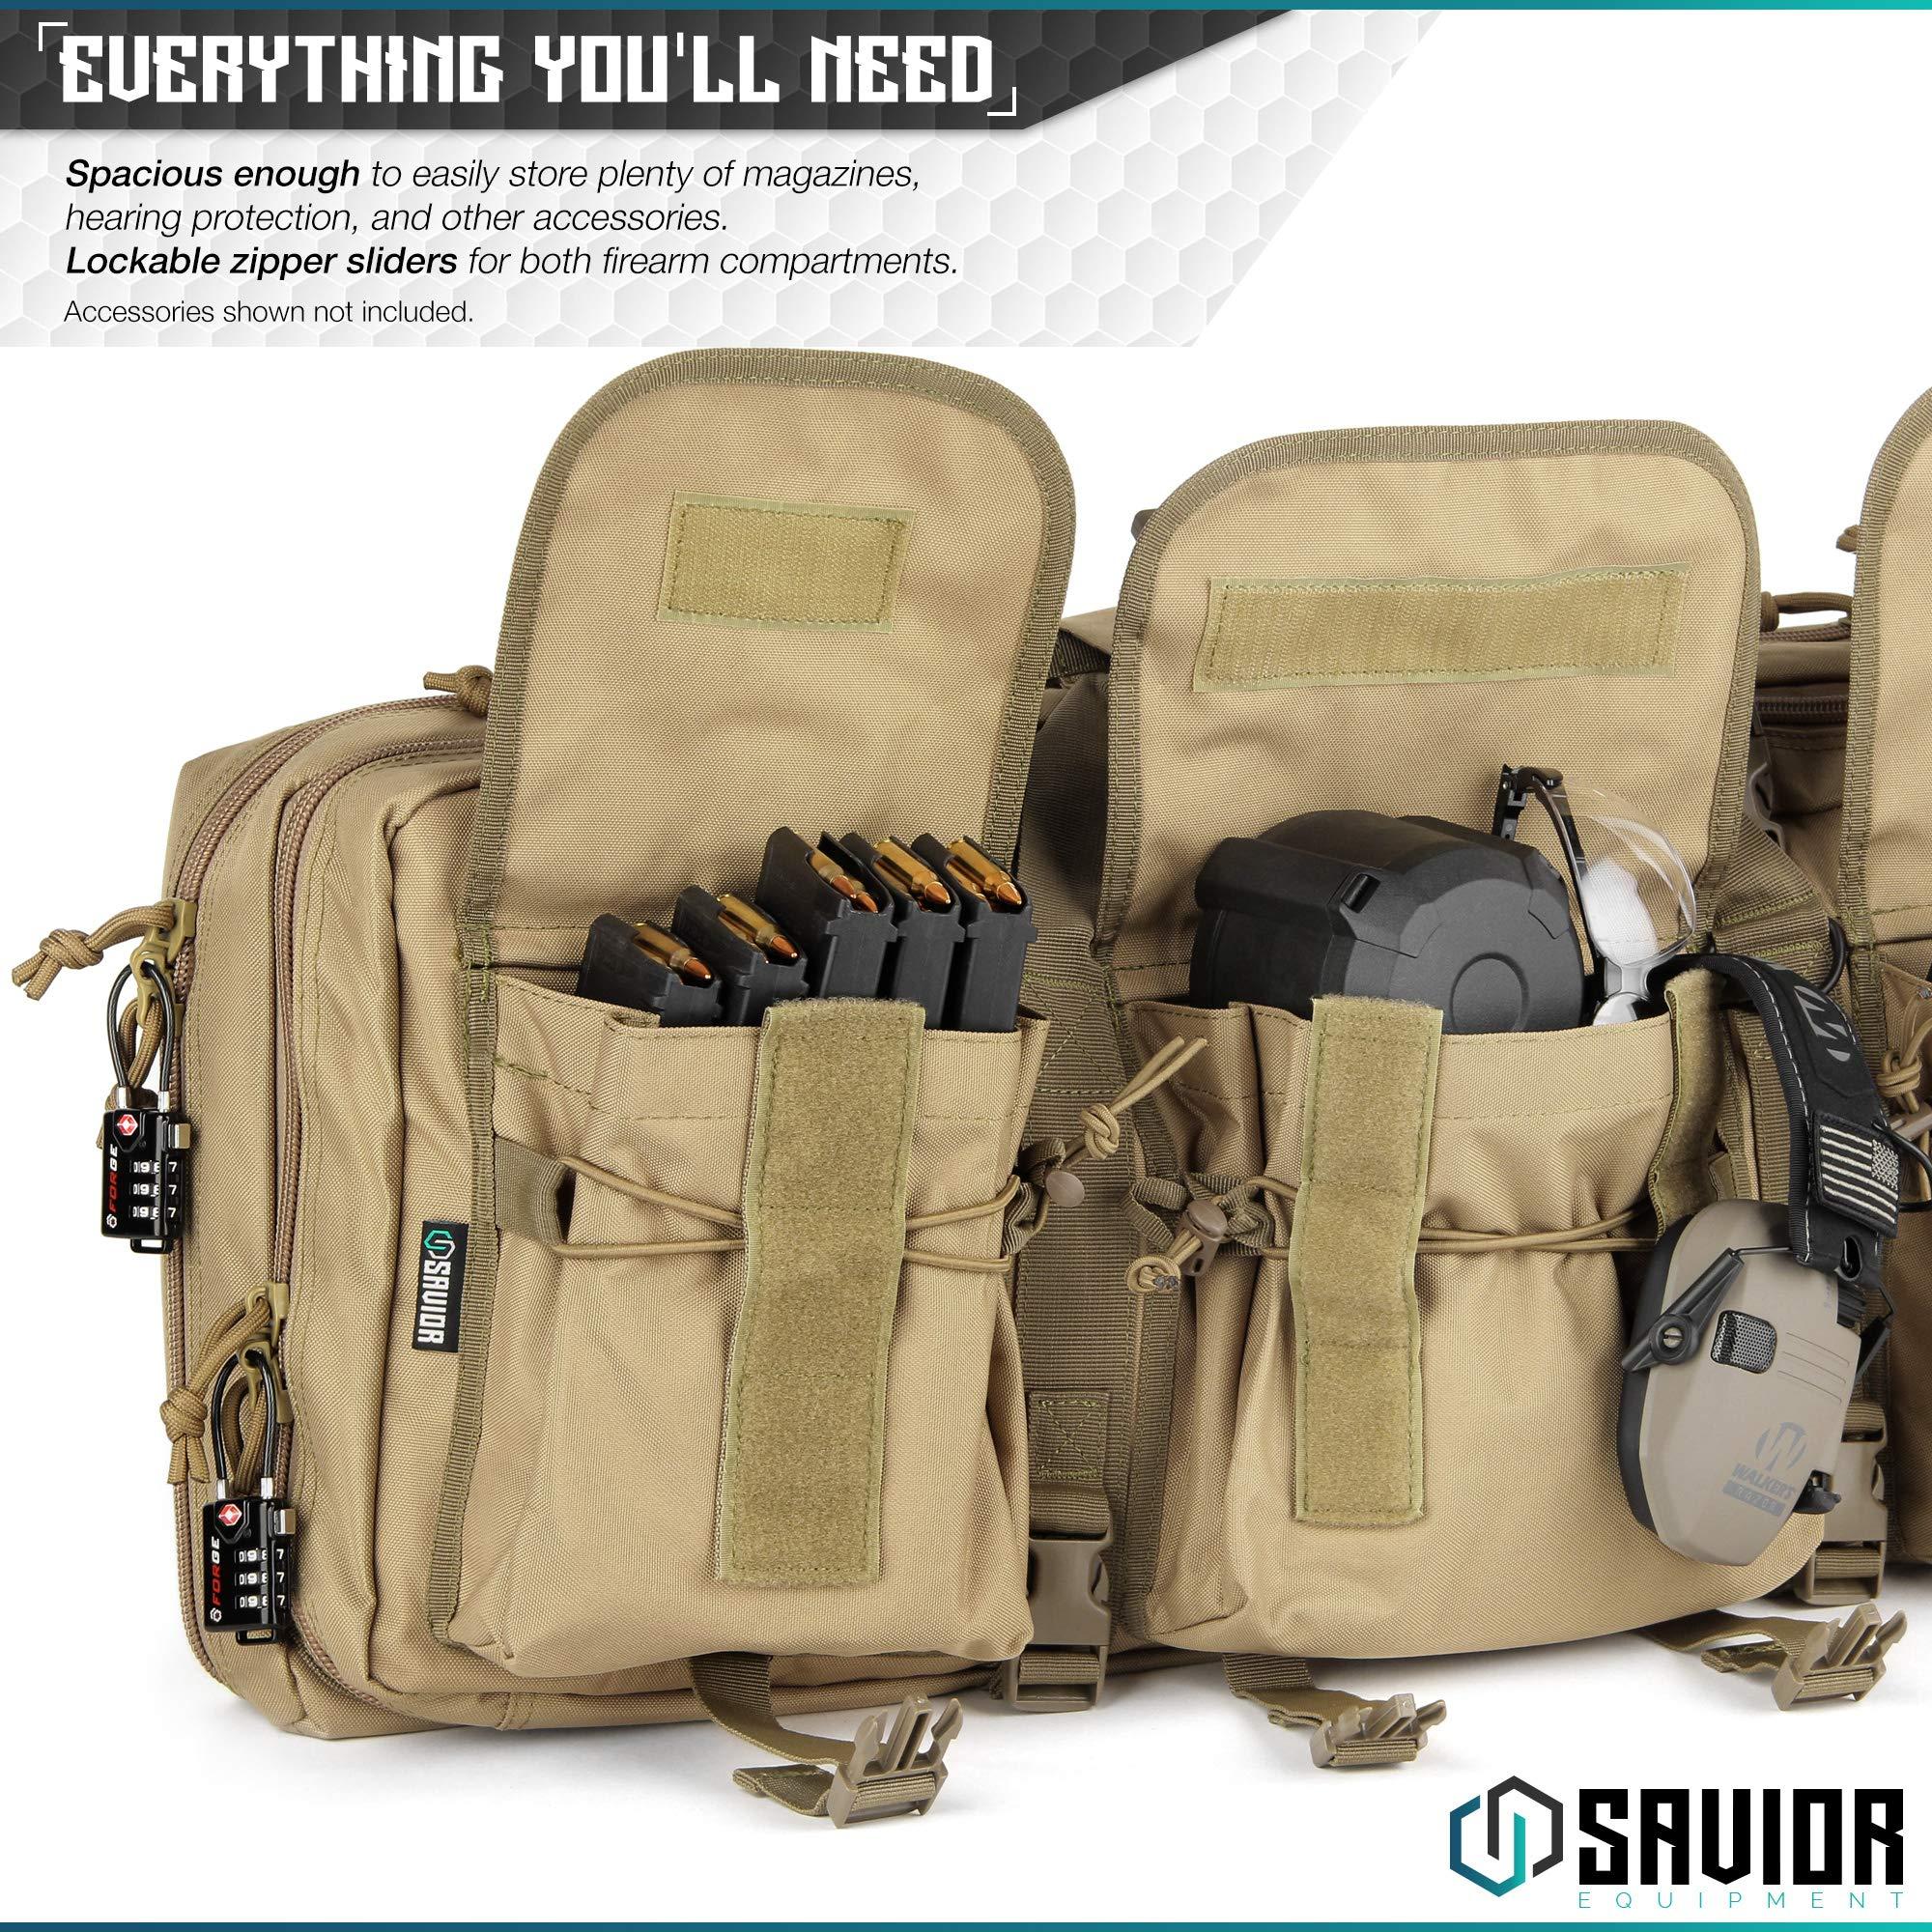 Savior Equipment American Classic Tactical Double Short Barrel Rifle Gun Case Firearm Bag - Suitable for Subgun Bullpups Carbine Shotgun SMG SBR AR AK Pistol, Available Length in 24'' 28'' 32'' by Savior Equipment (Image #5)